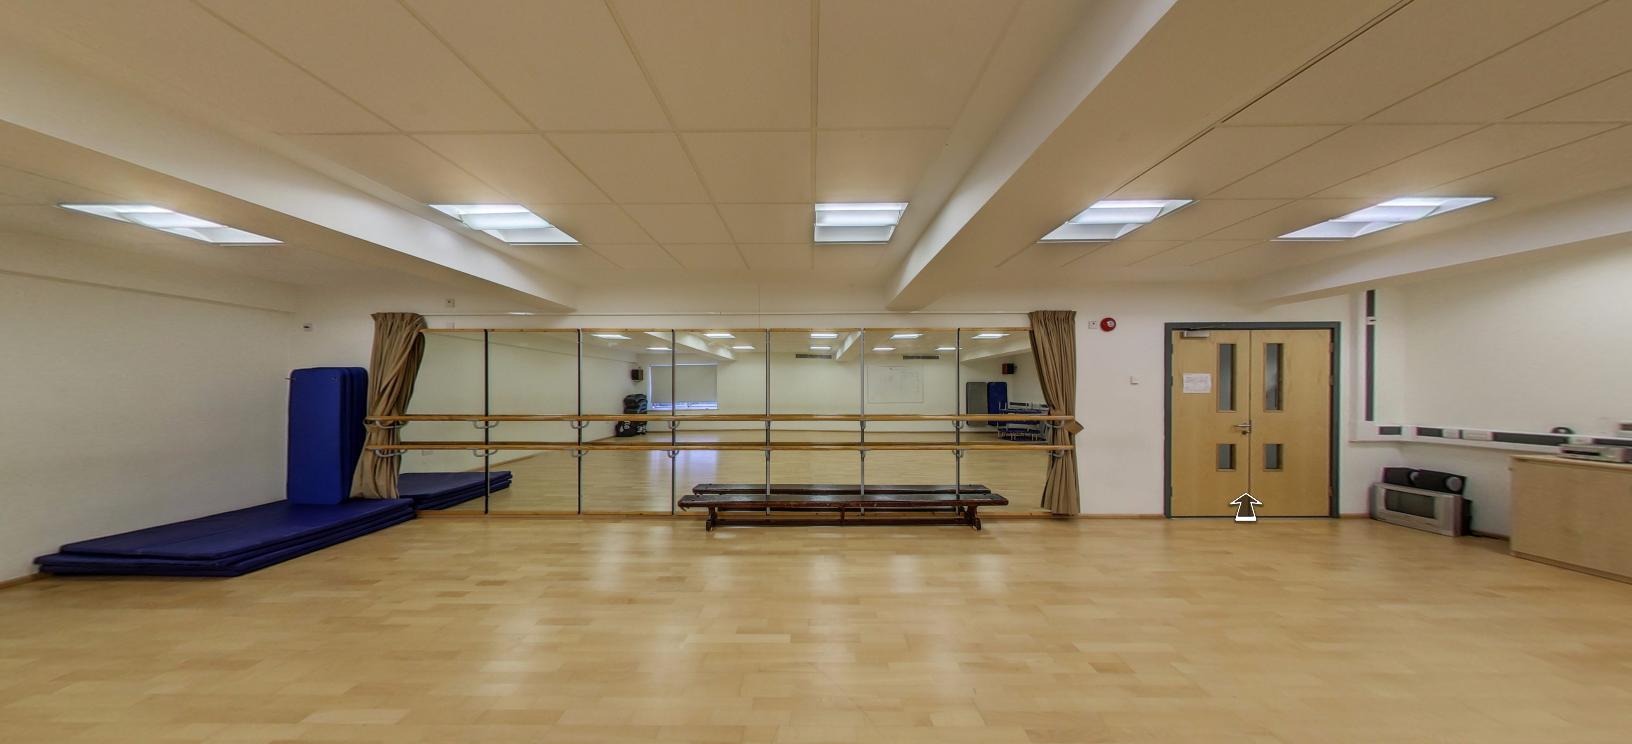 Dance Studio dimensions: 13m x 8m